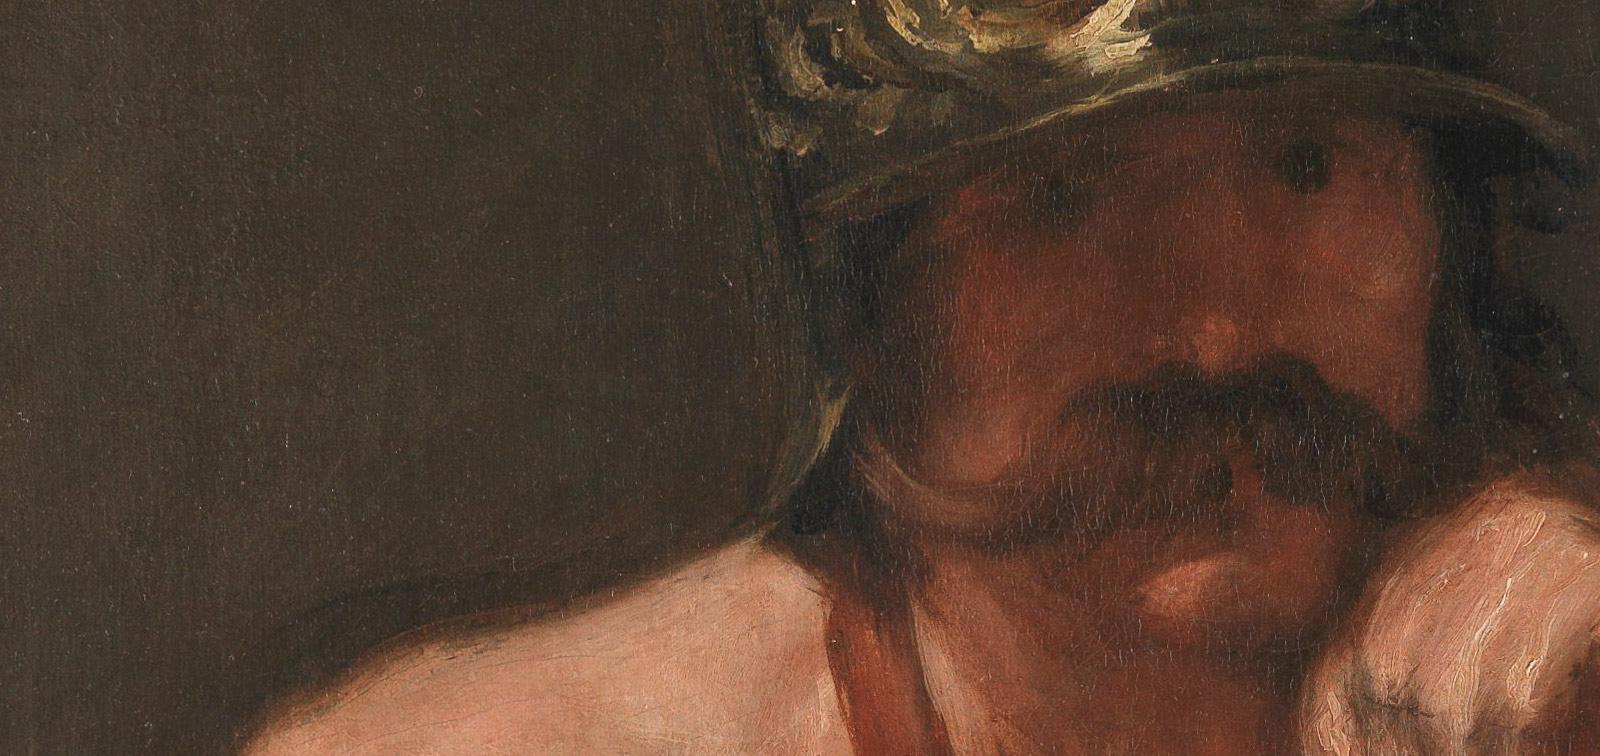 <em>Velázquez, más allá de la pintura</em>